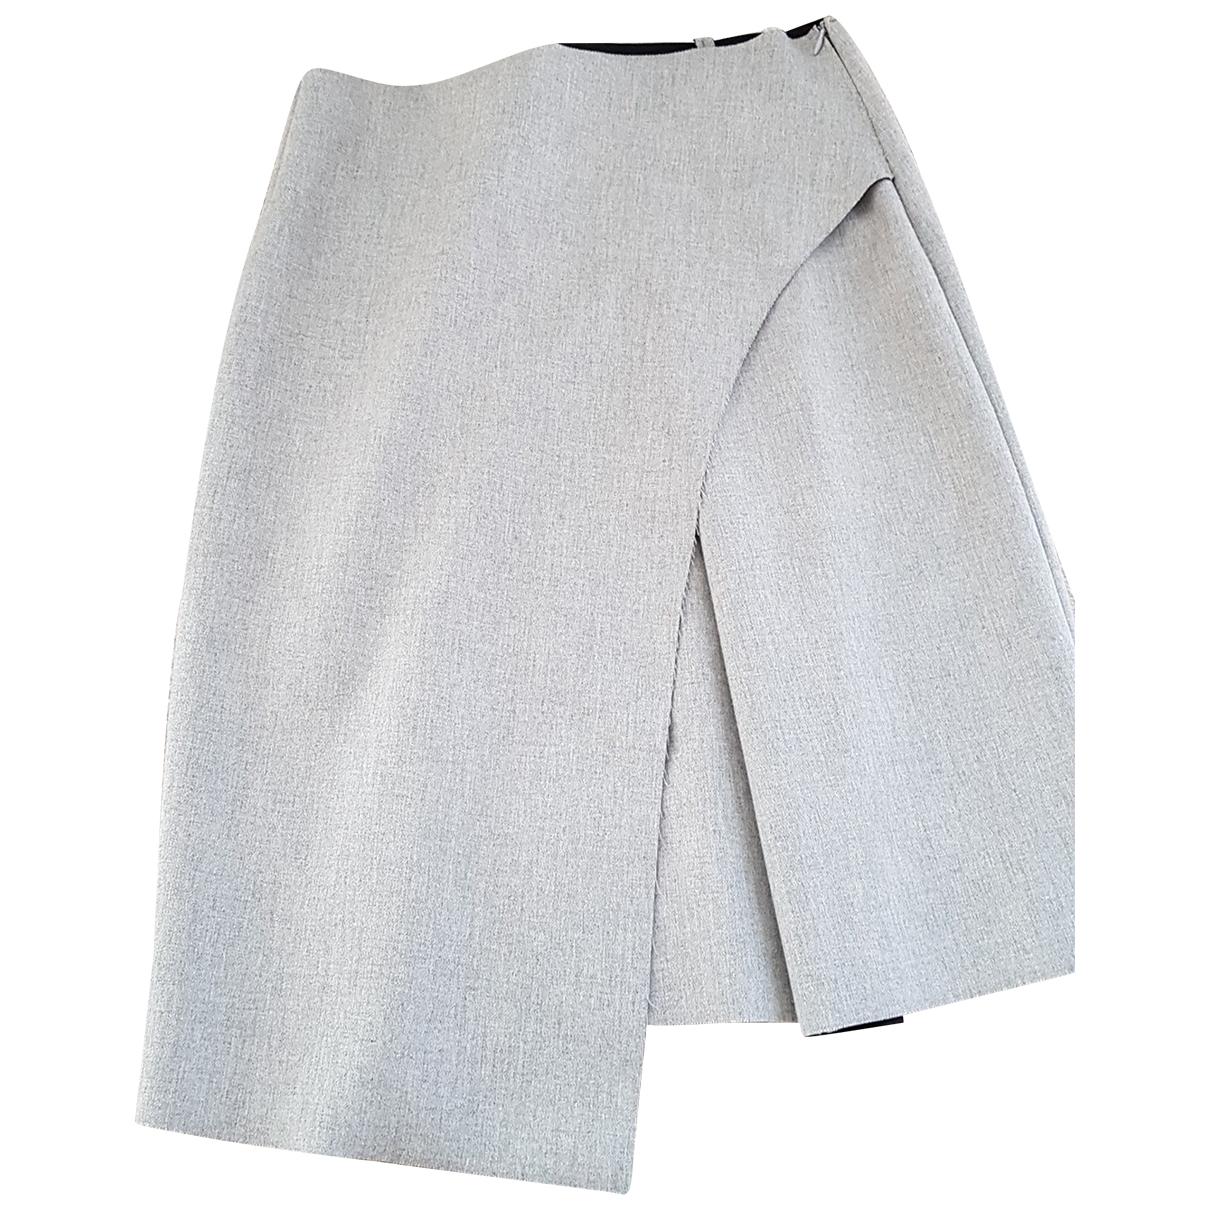 Zara N Grey Wool skirt for Women M International